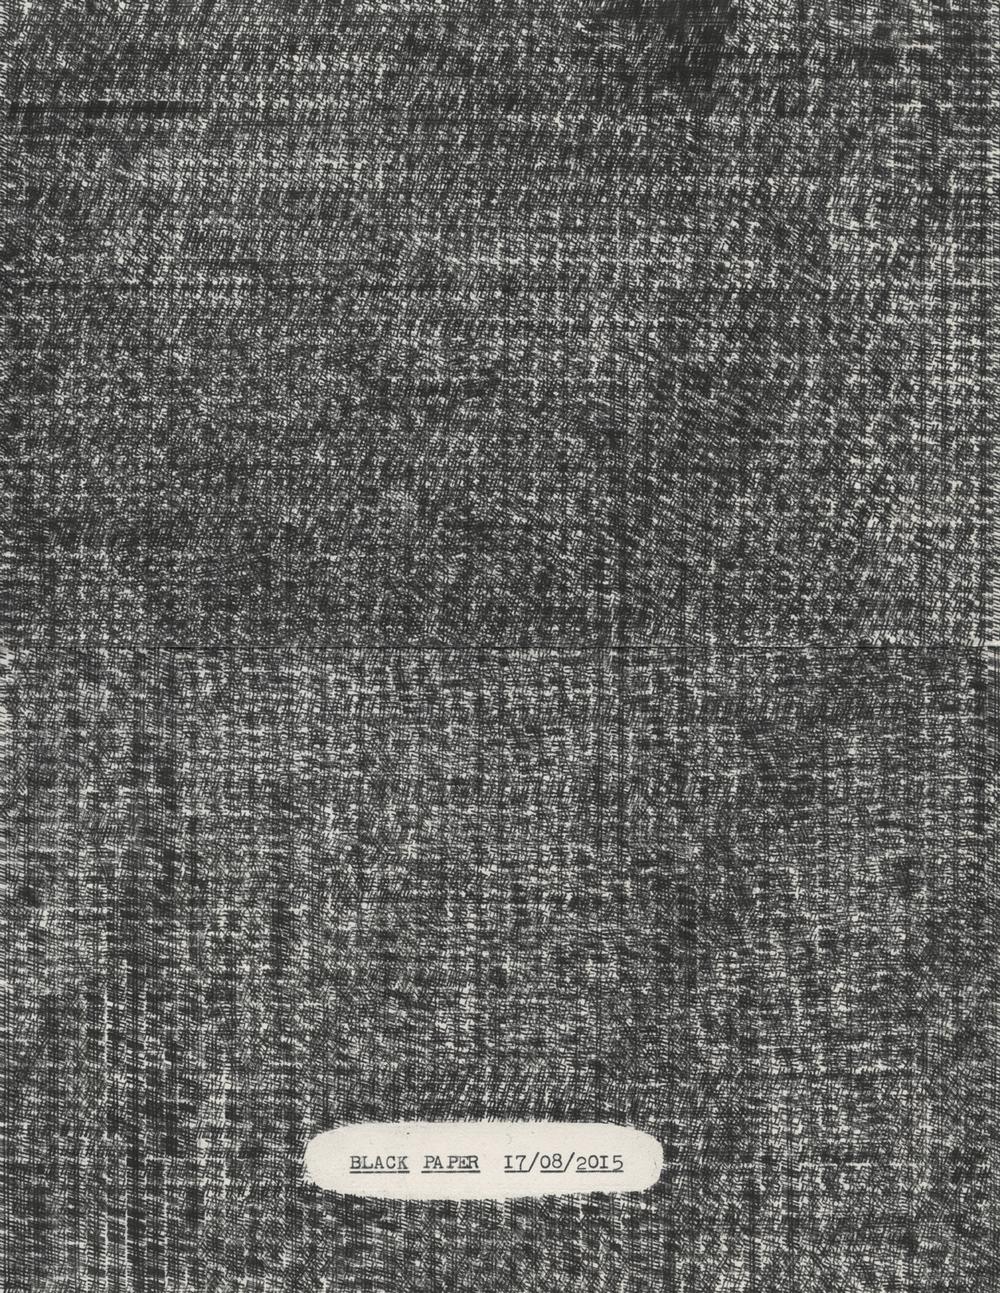 tw_17_08_2015_black_paper.jpg